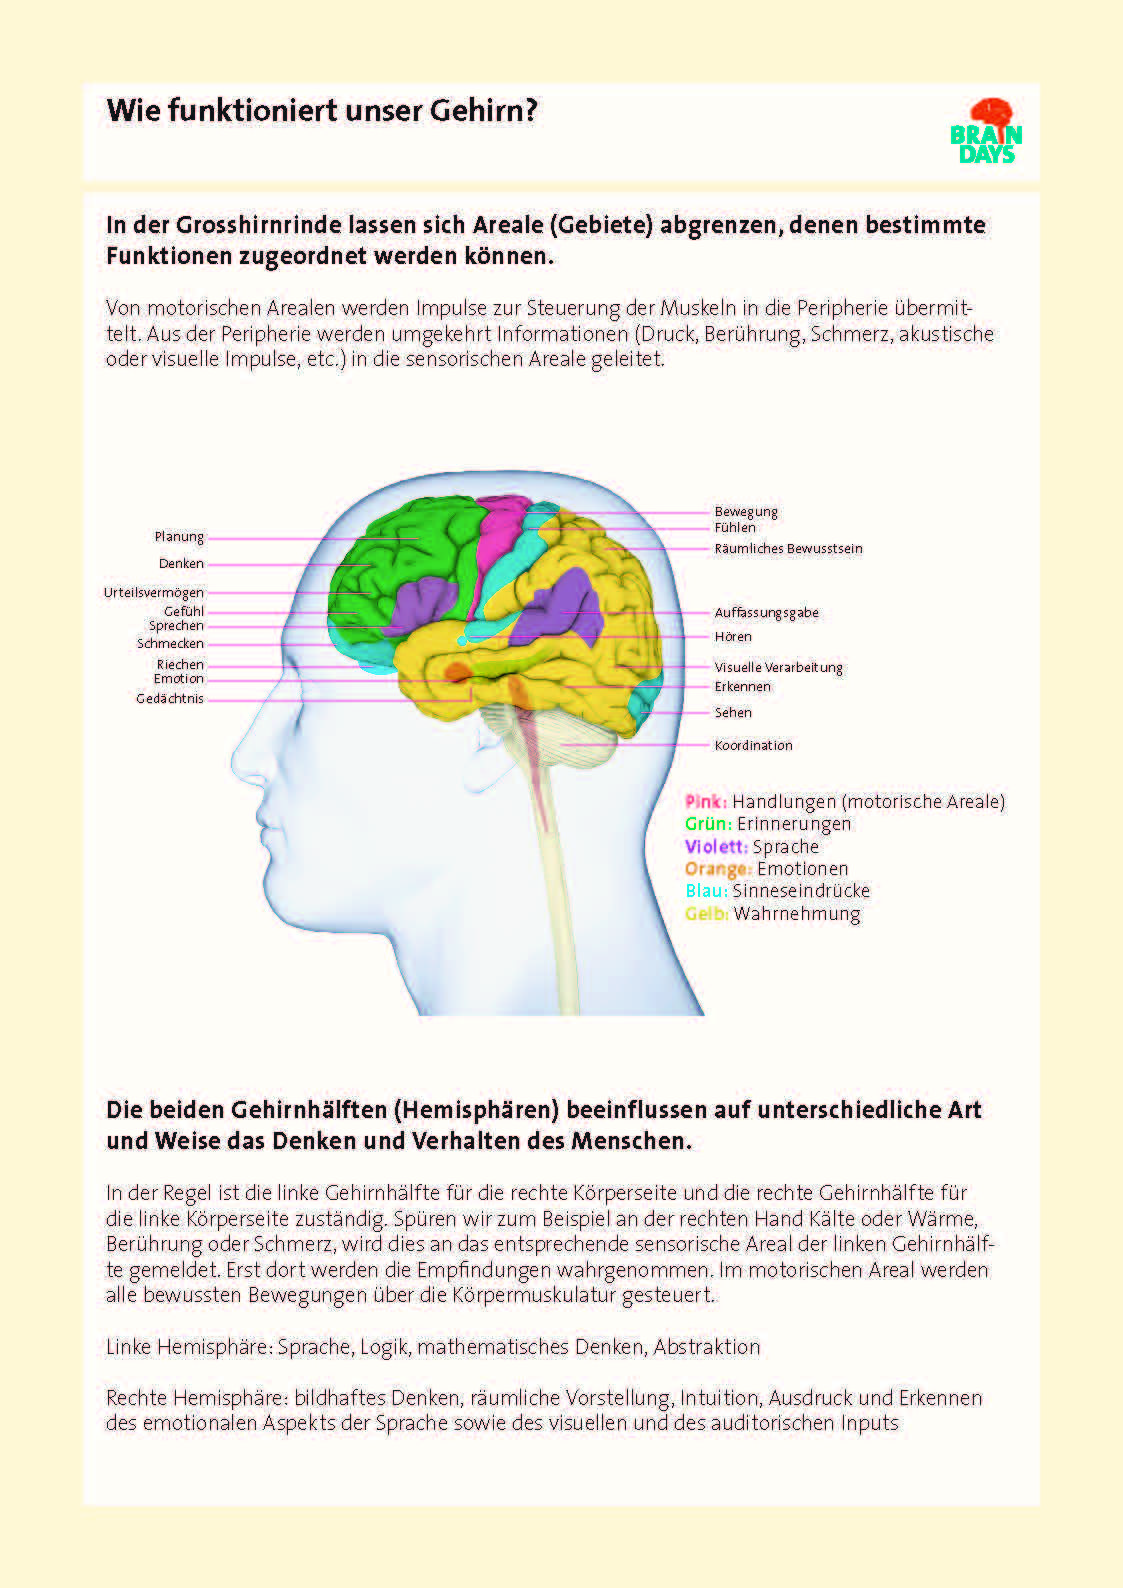 SimplyScience - Brain Days - Unser Gehirn | Neurowissenschaften ...